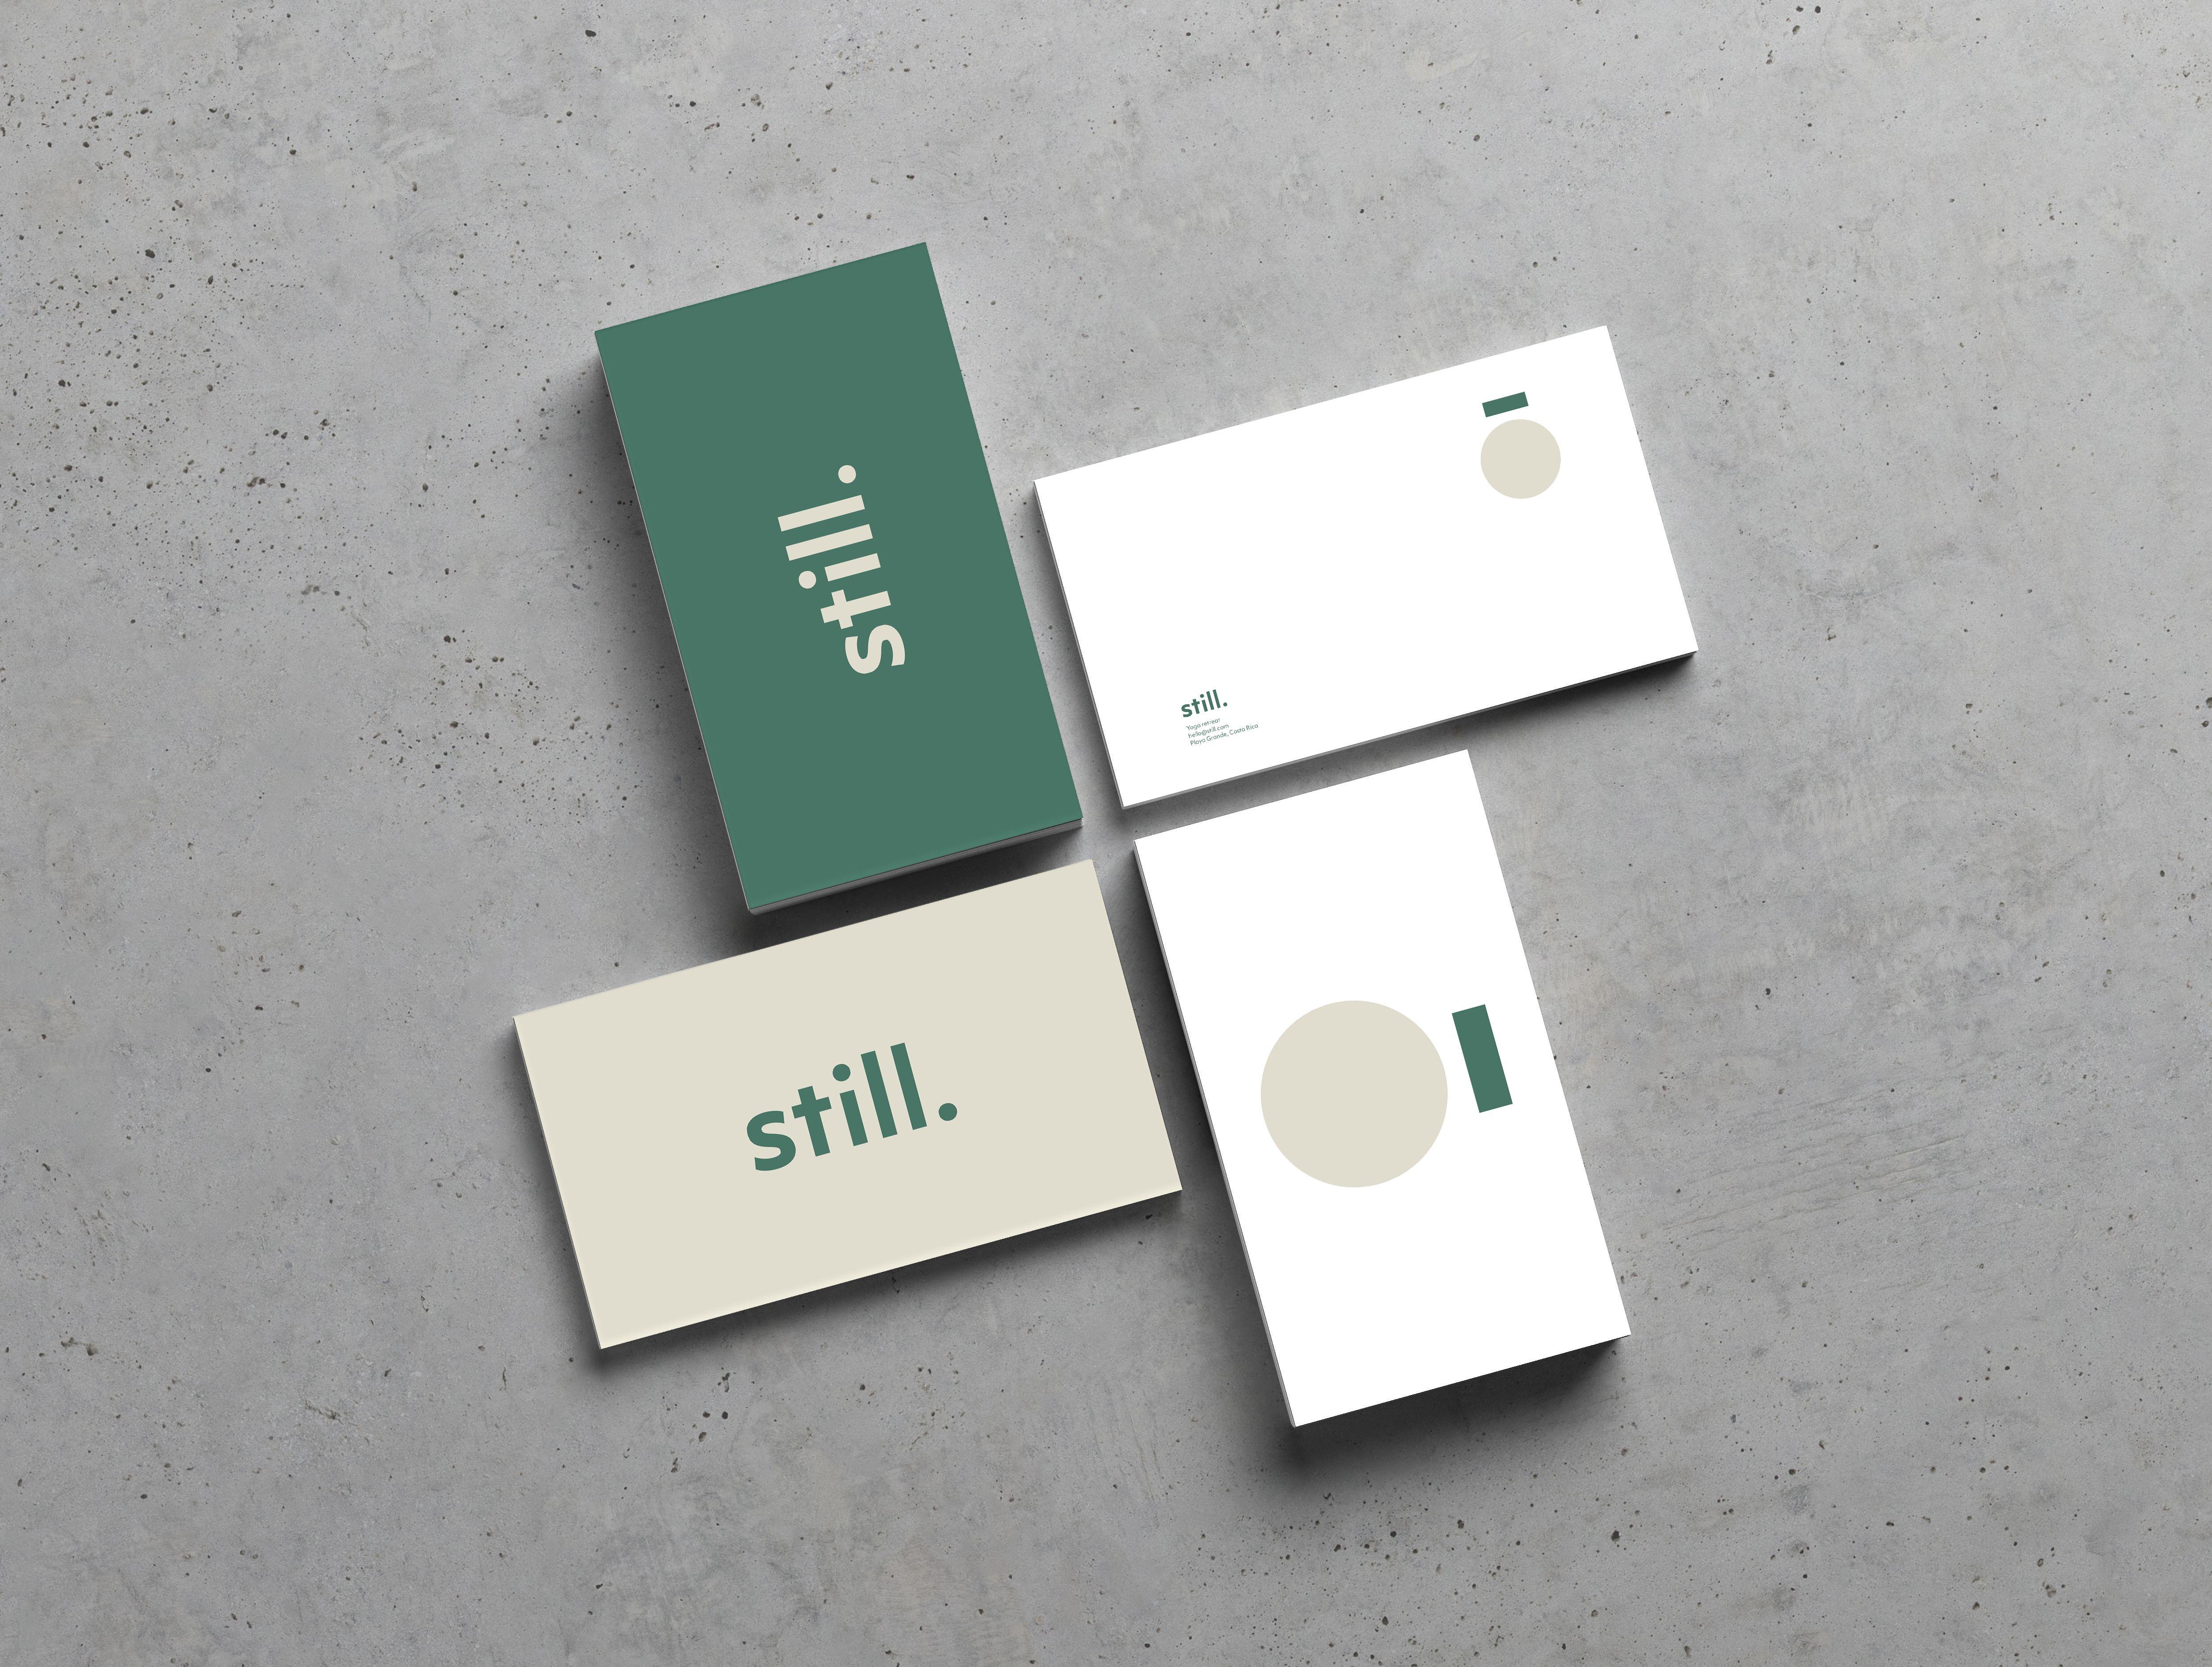 Created a visual identity for still a yoga retreat in